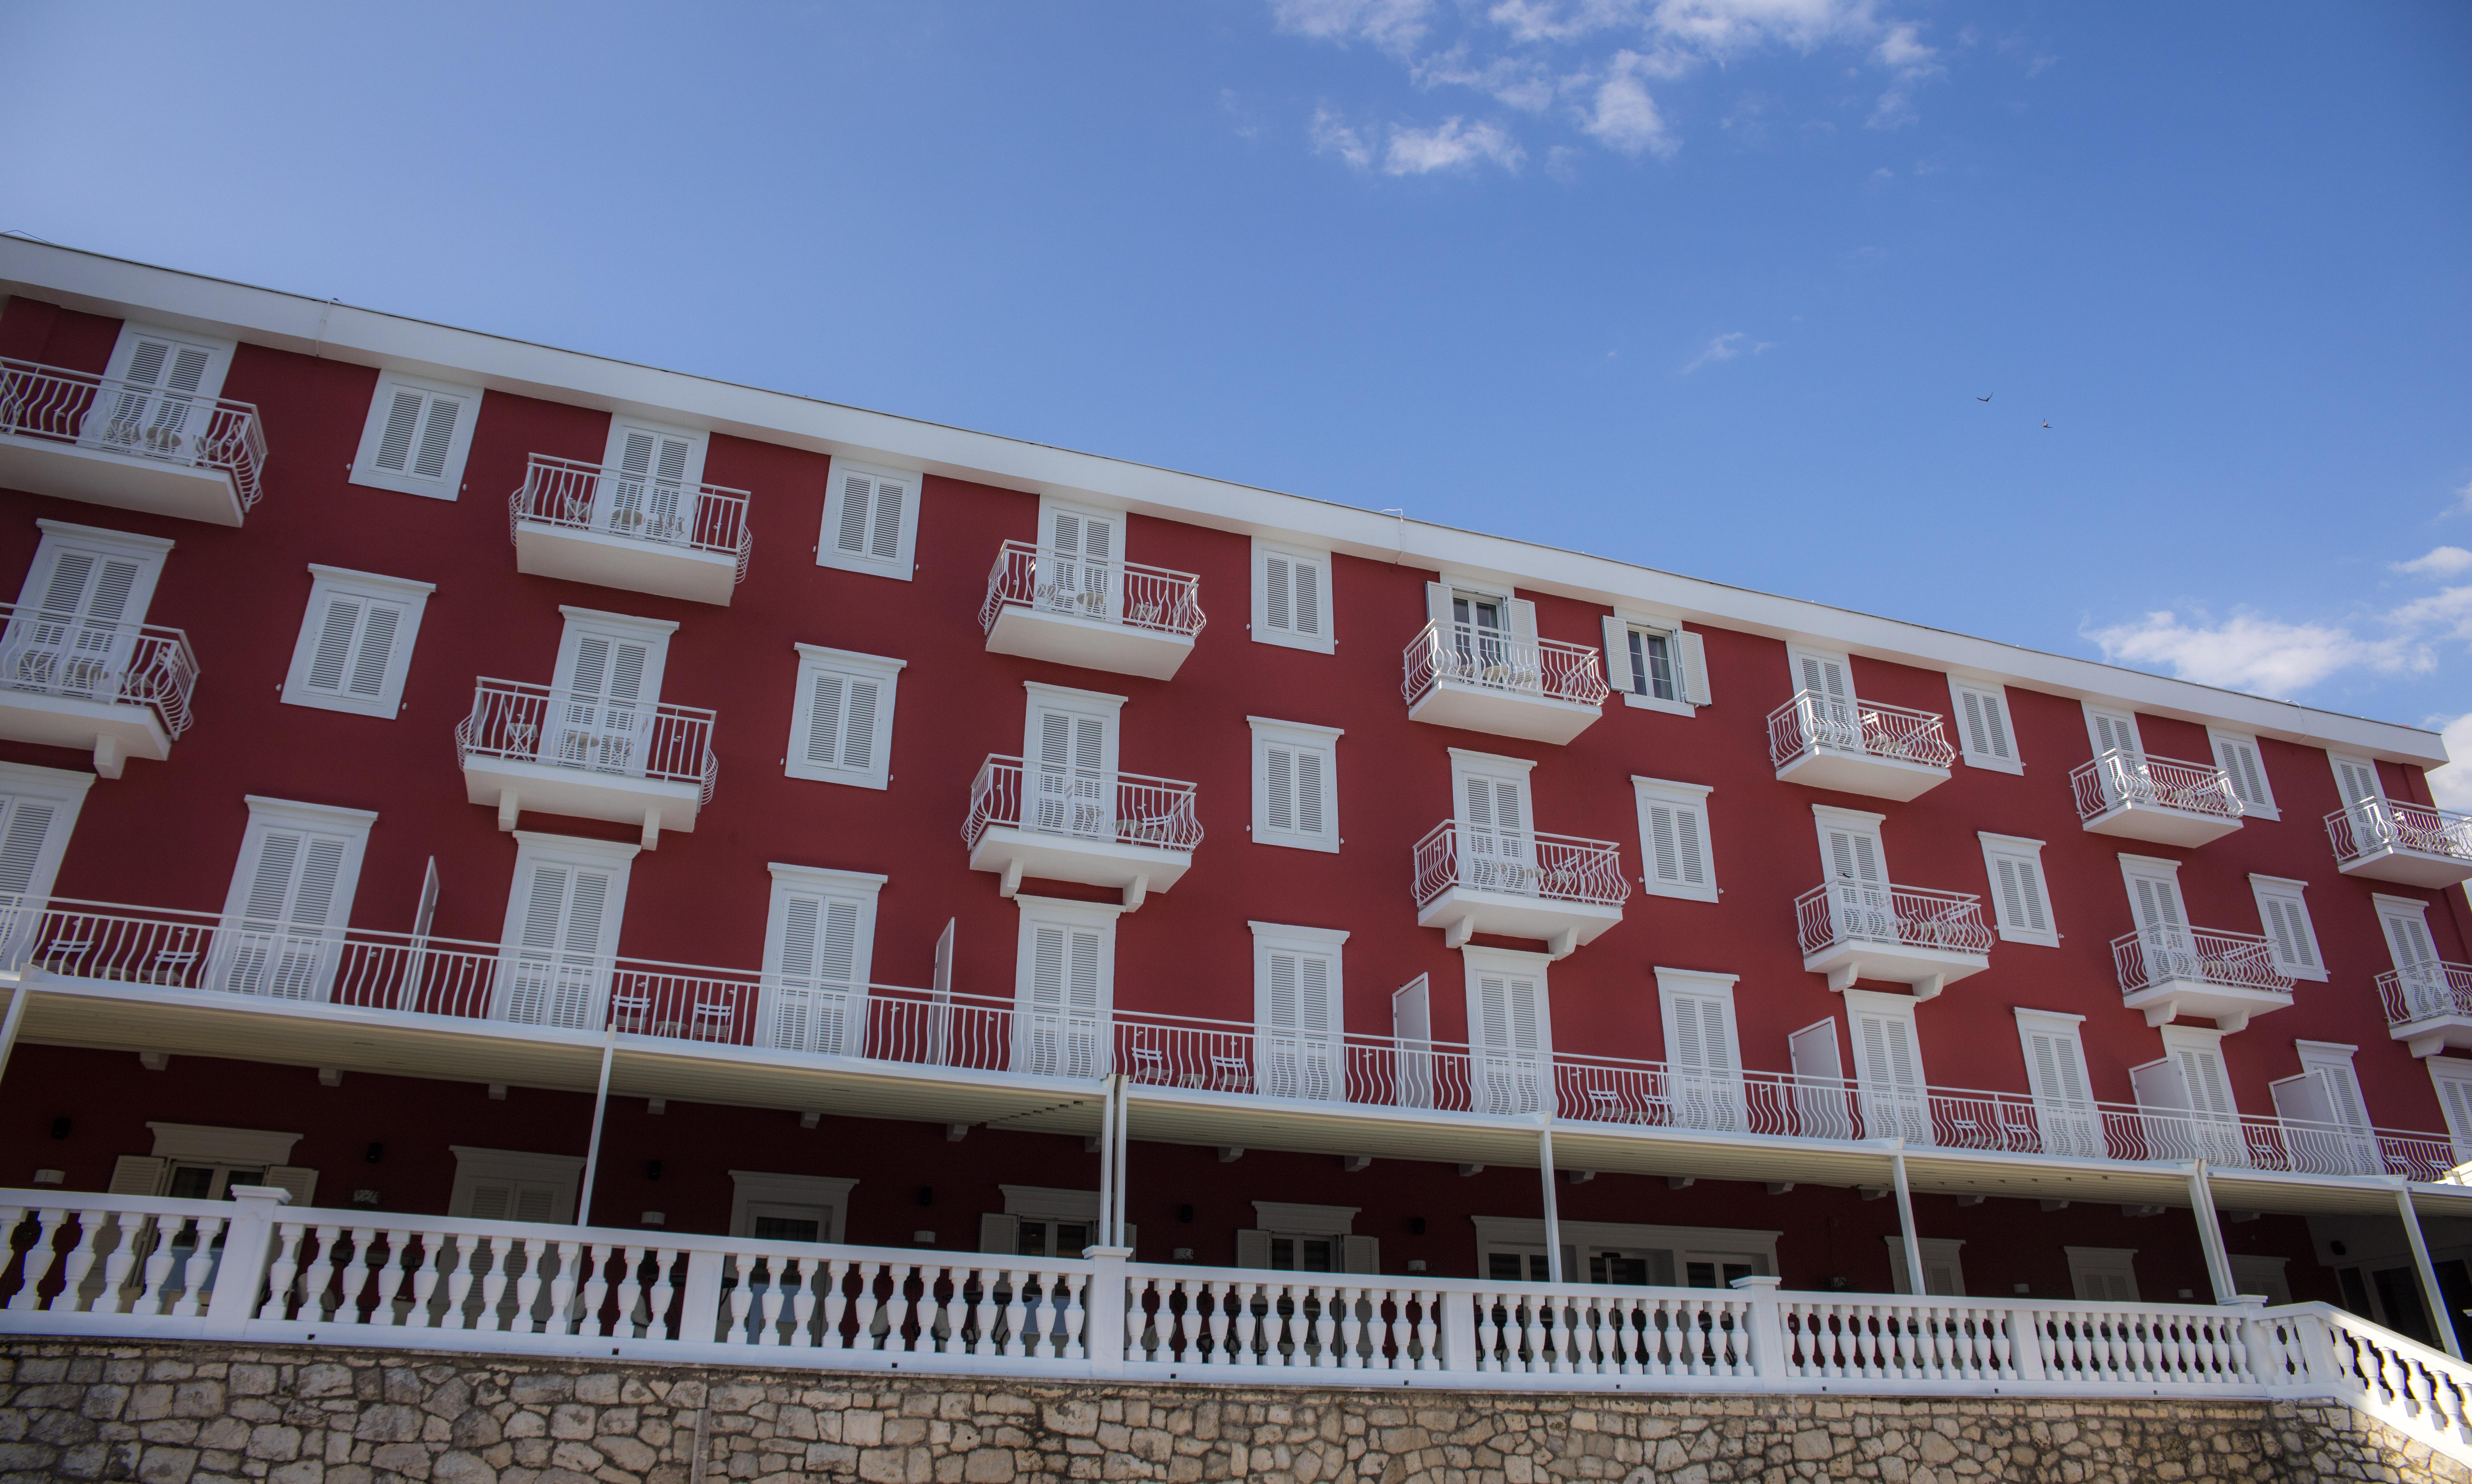 Hotel_and_dependance_Bellevue,_Orebić_27